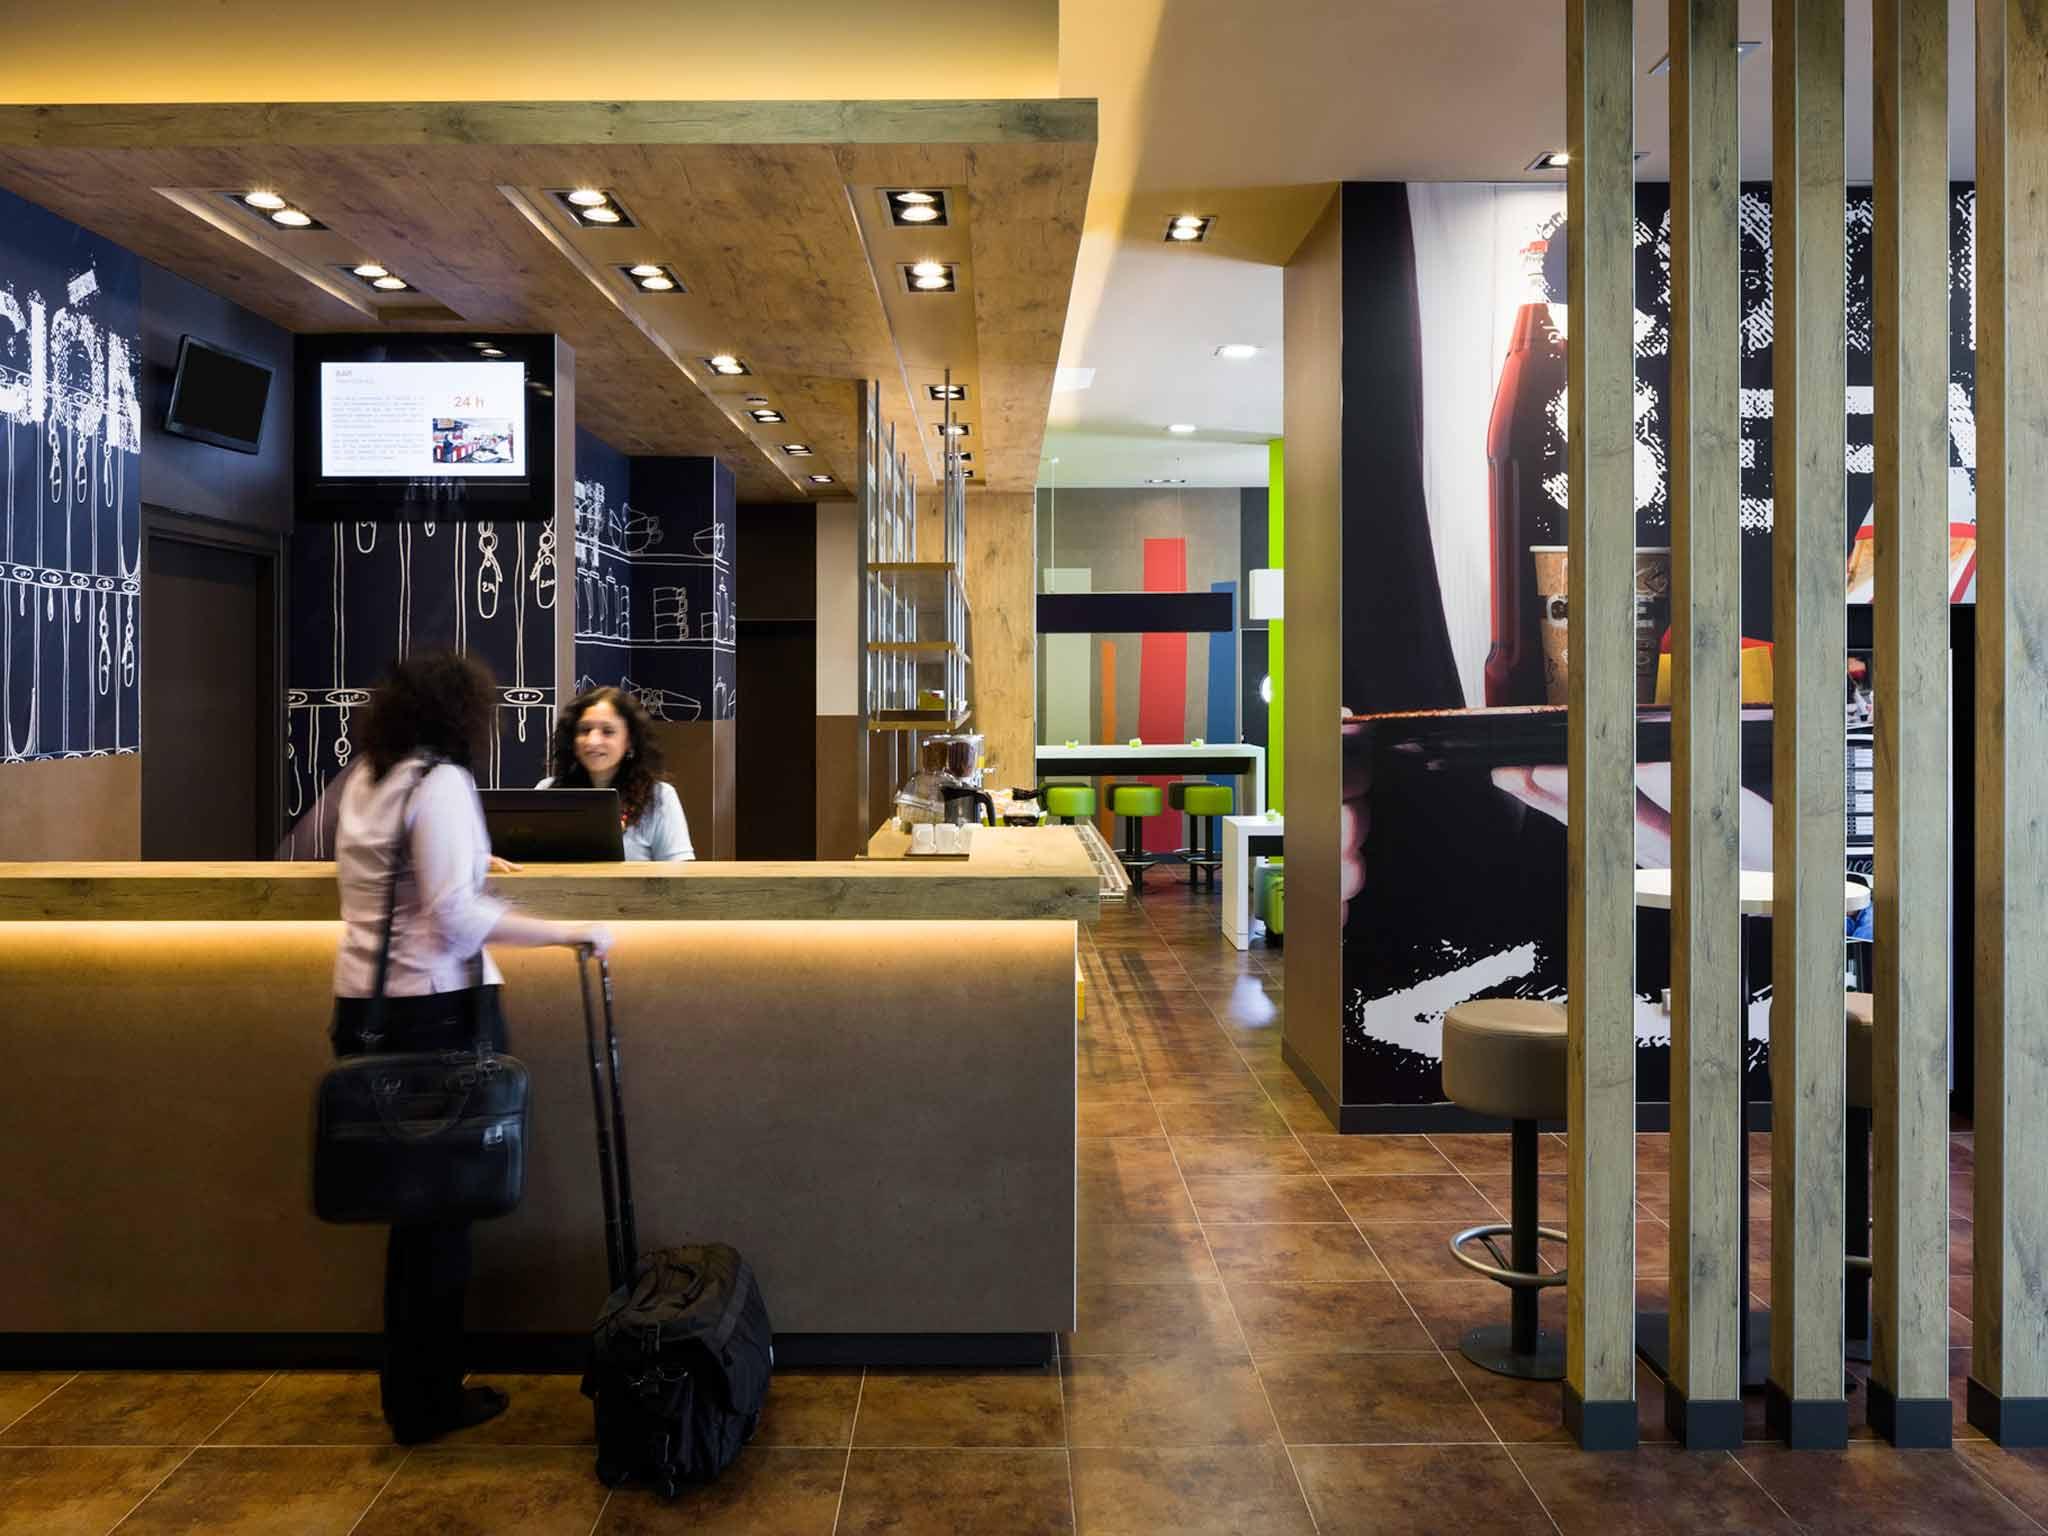 Alojamiento – ibis budget Sevilla Aeropuerto